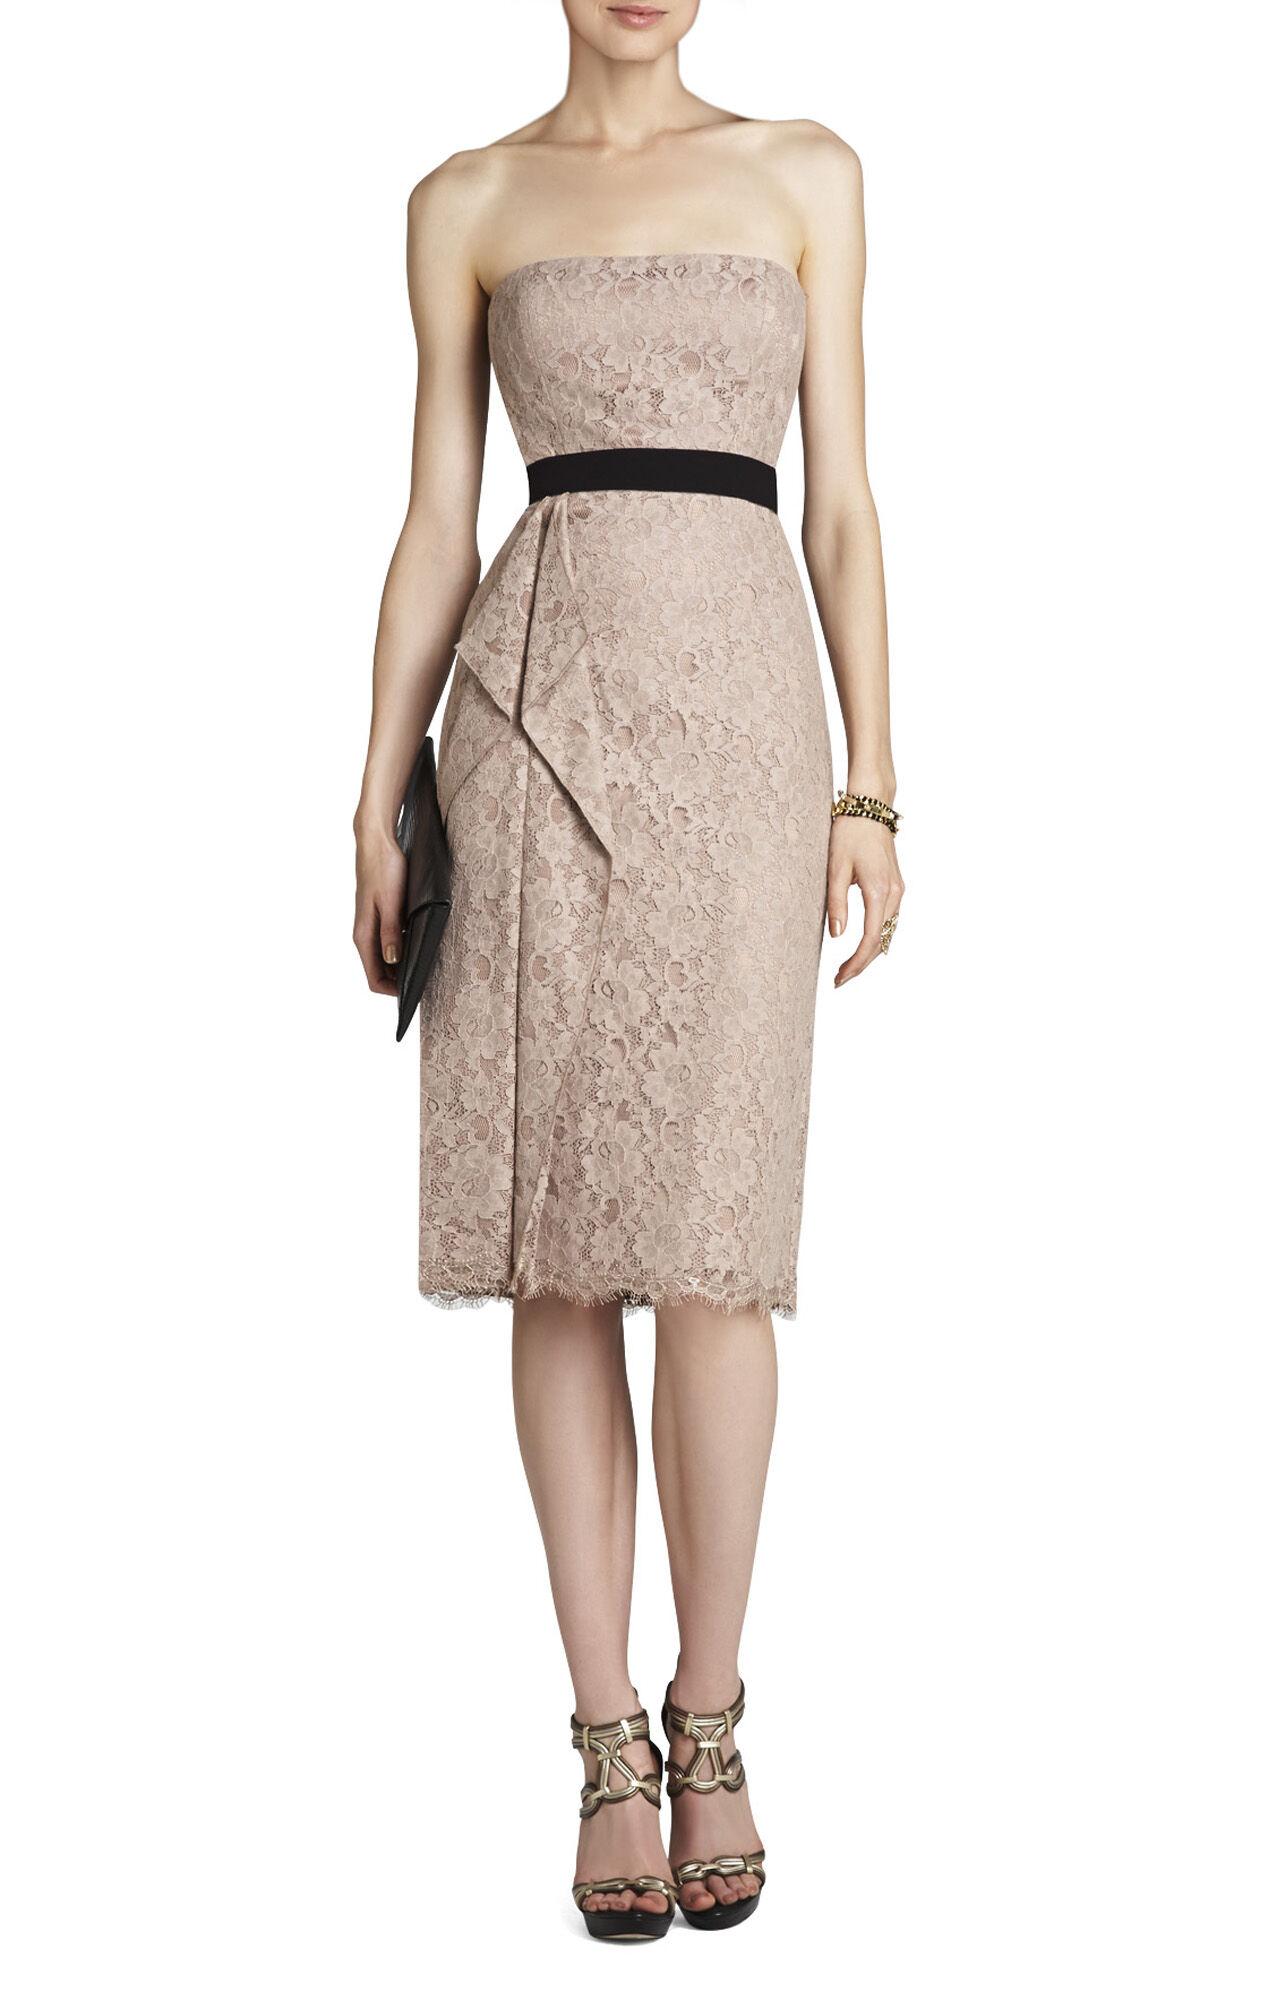 Alexandra Strapless Dress With Side-Drape